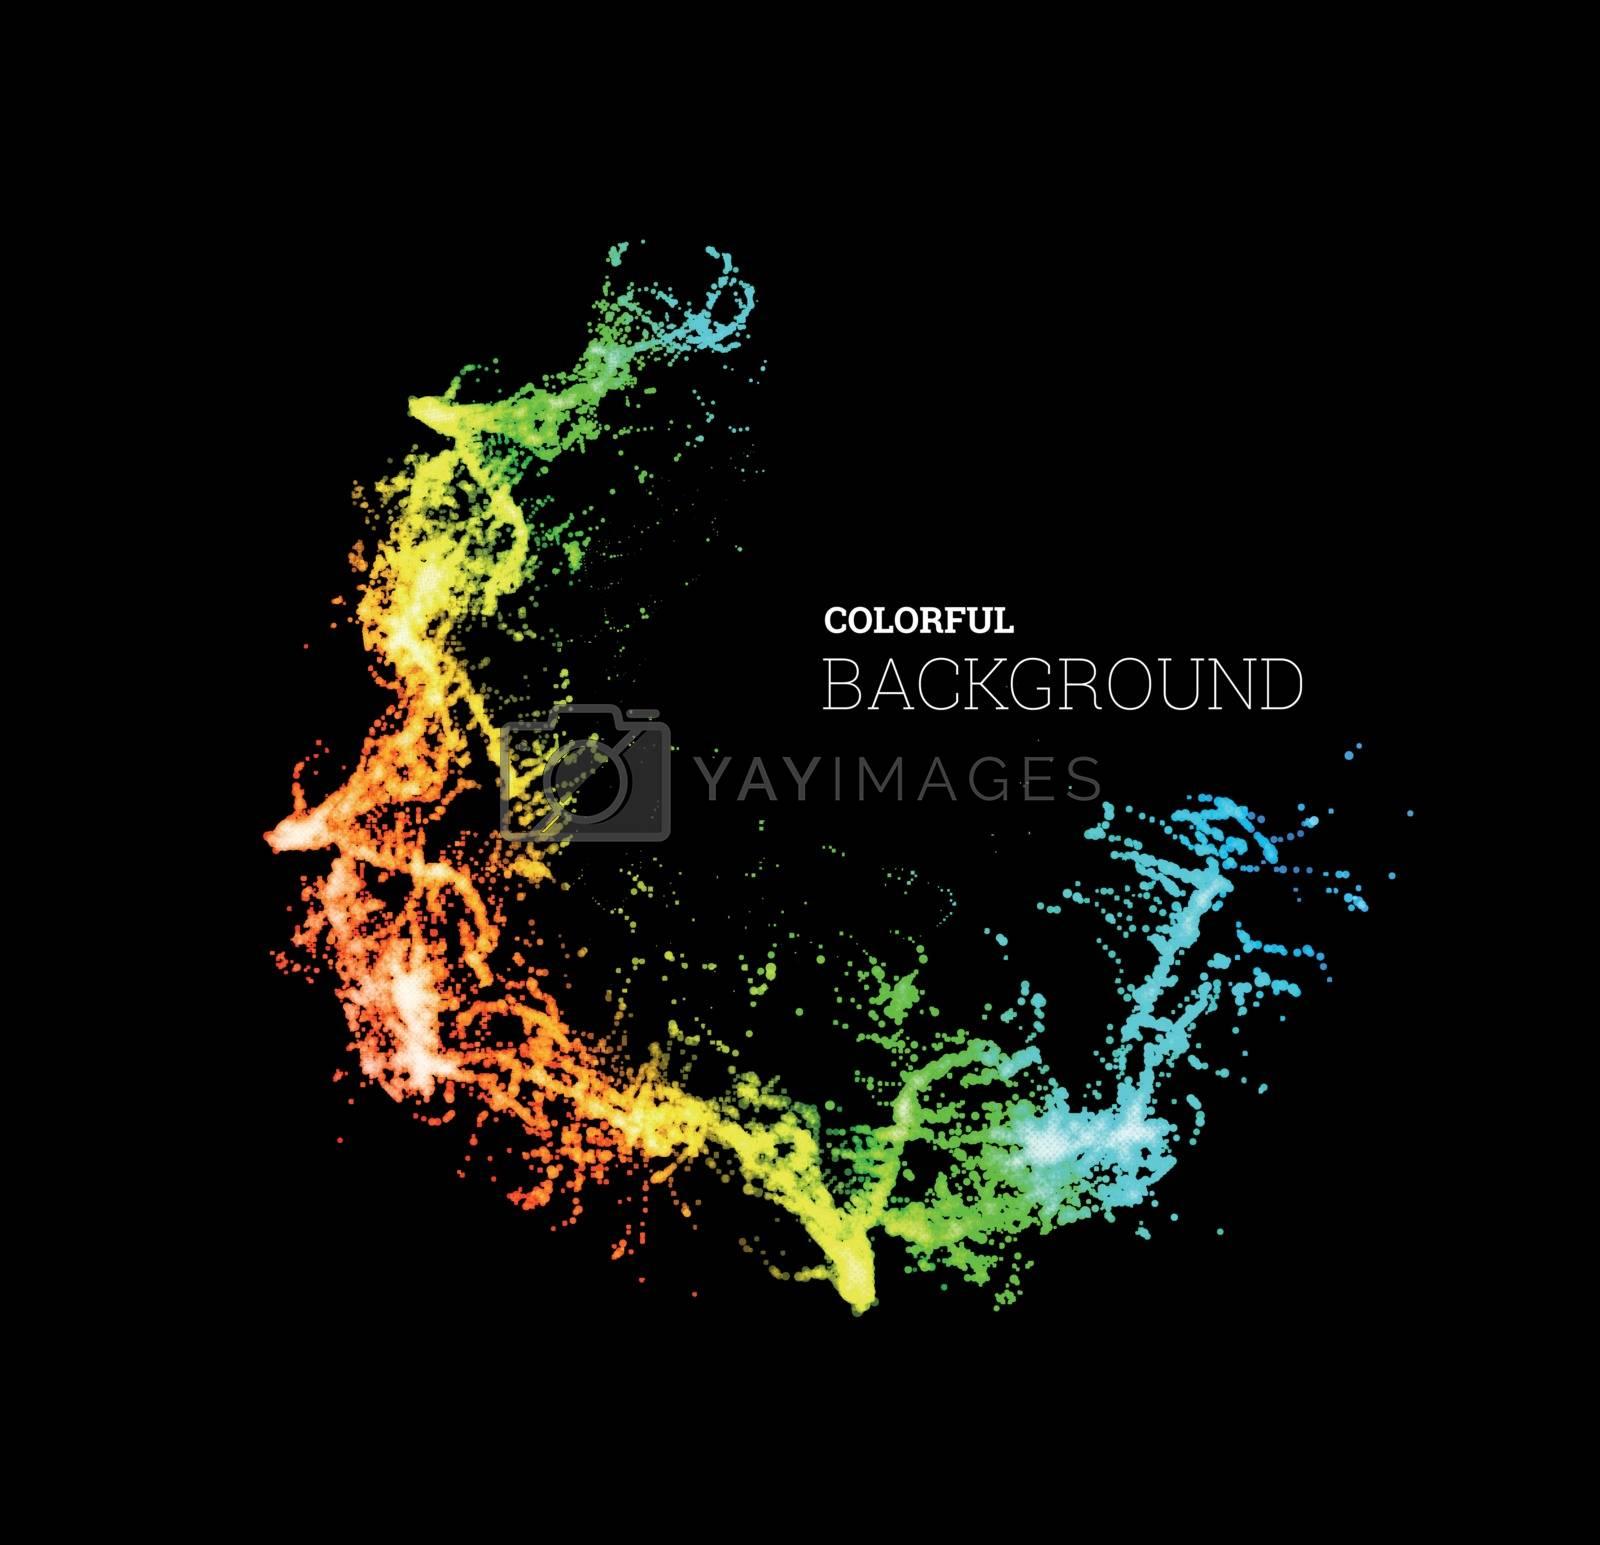 Splash paint, colorful multicolored background. Vector illustration on black background